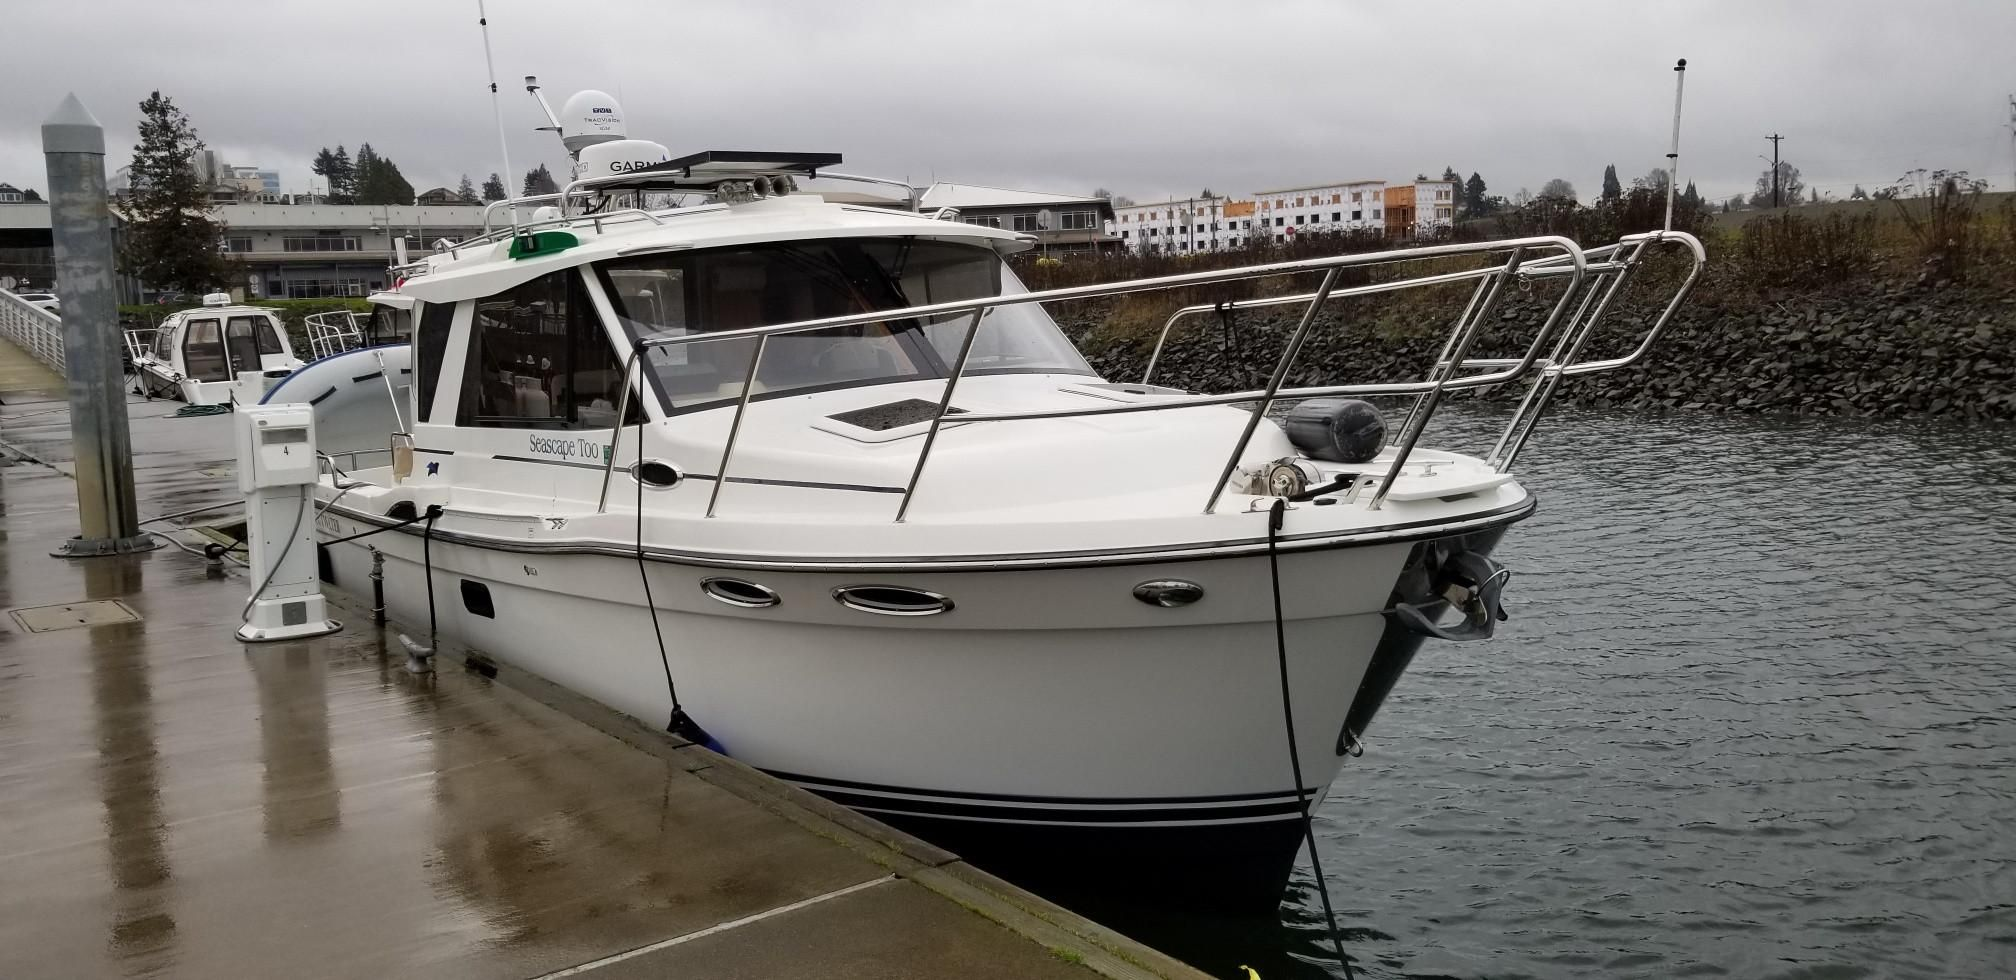 2017 Cutwater 28 Power Boat For Sale Www Yachtworld Com